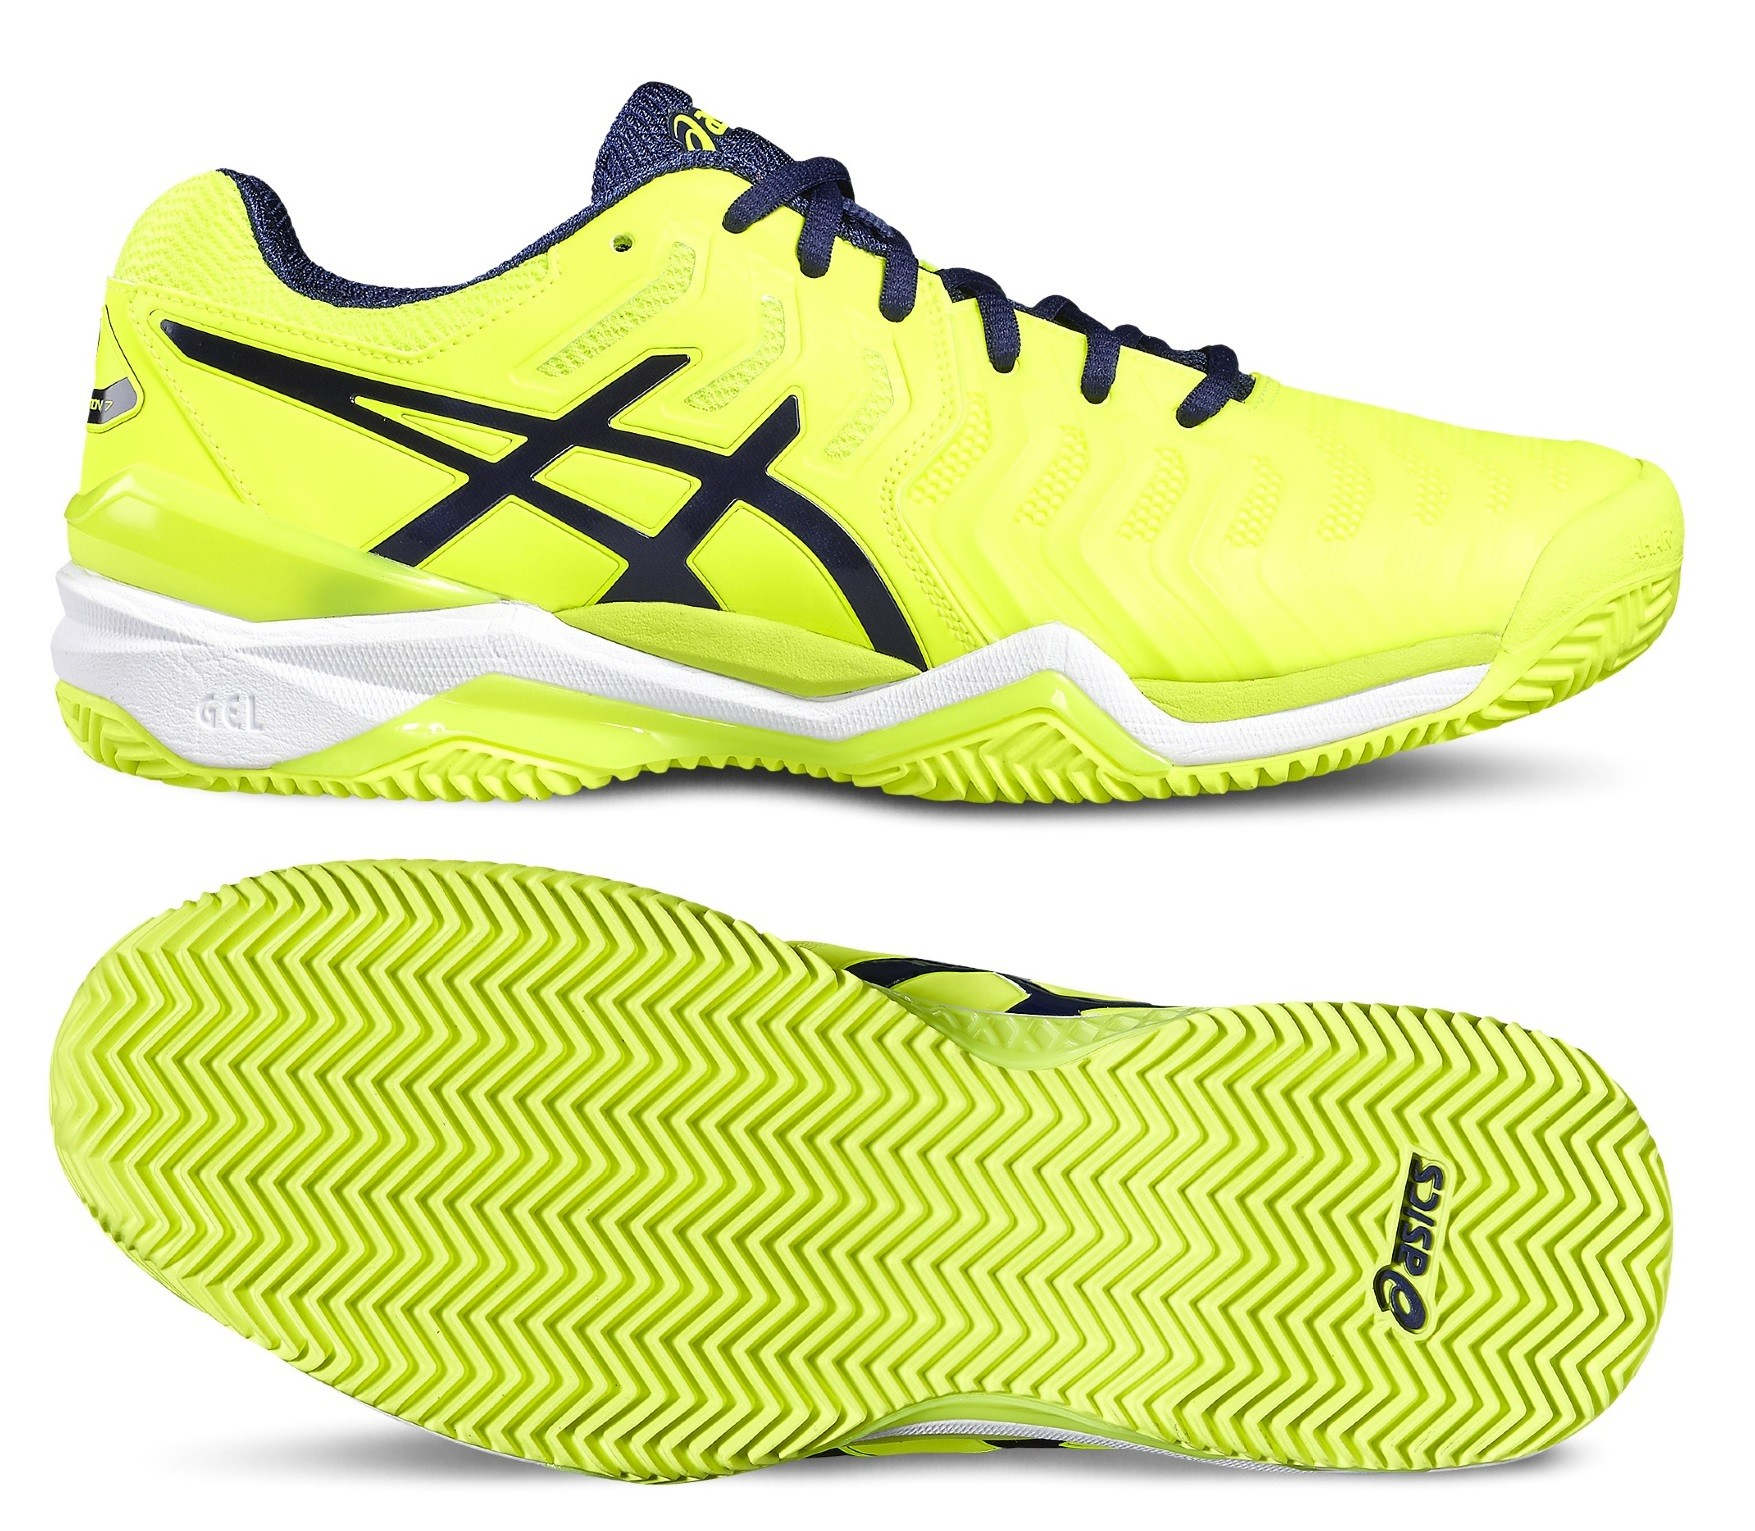 b2483330114 Tenisová obuv Asics Gel Resolution 7 Clay E702Y-0749 neonově žlutá